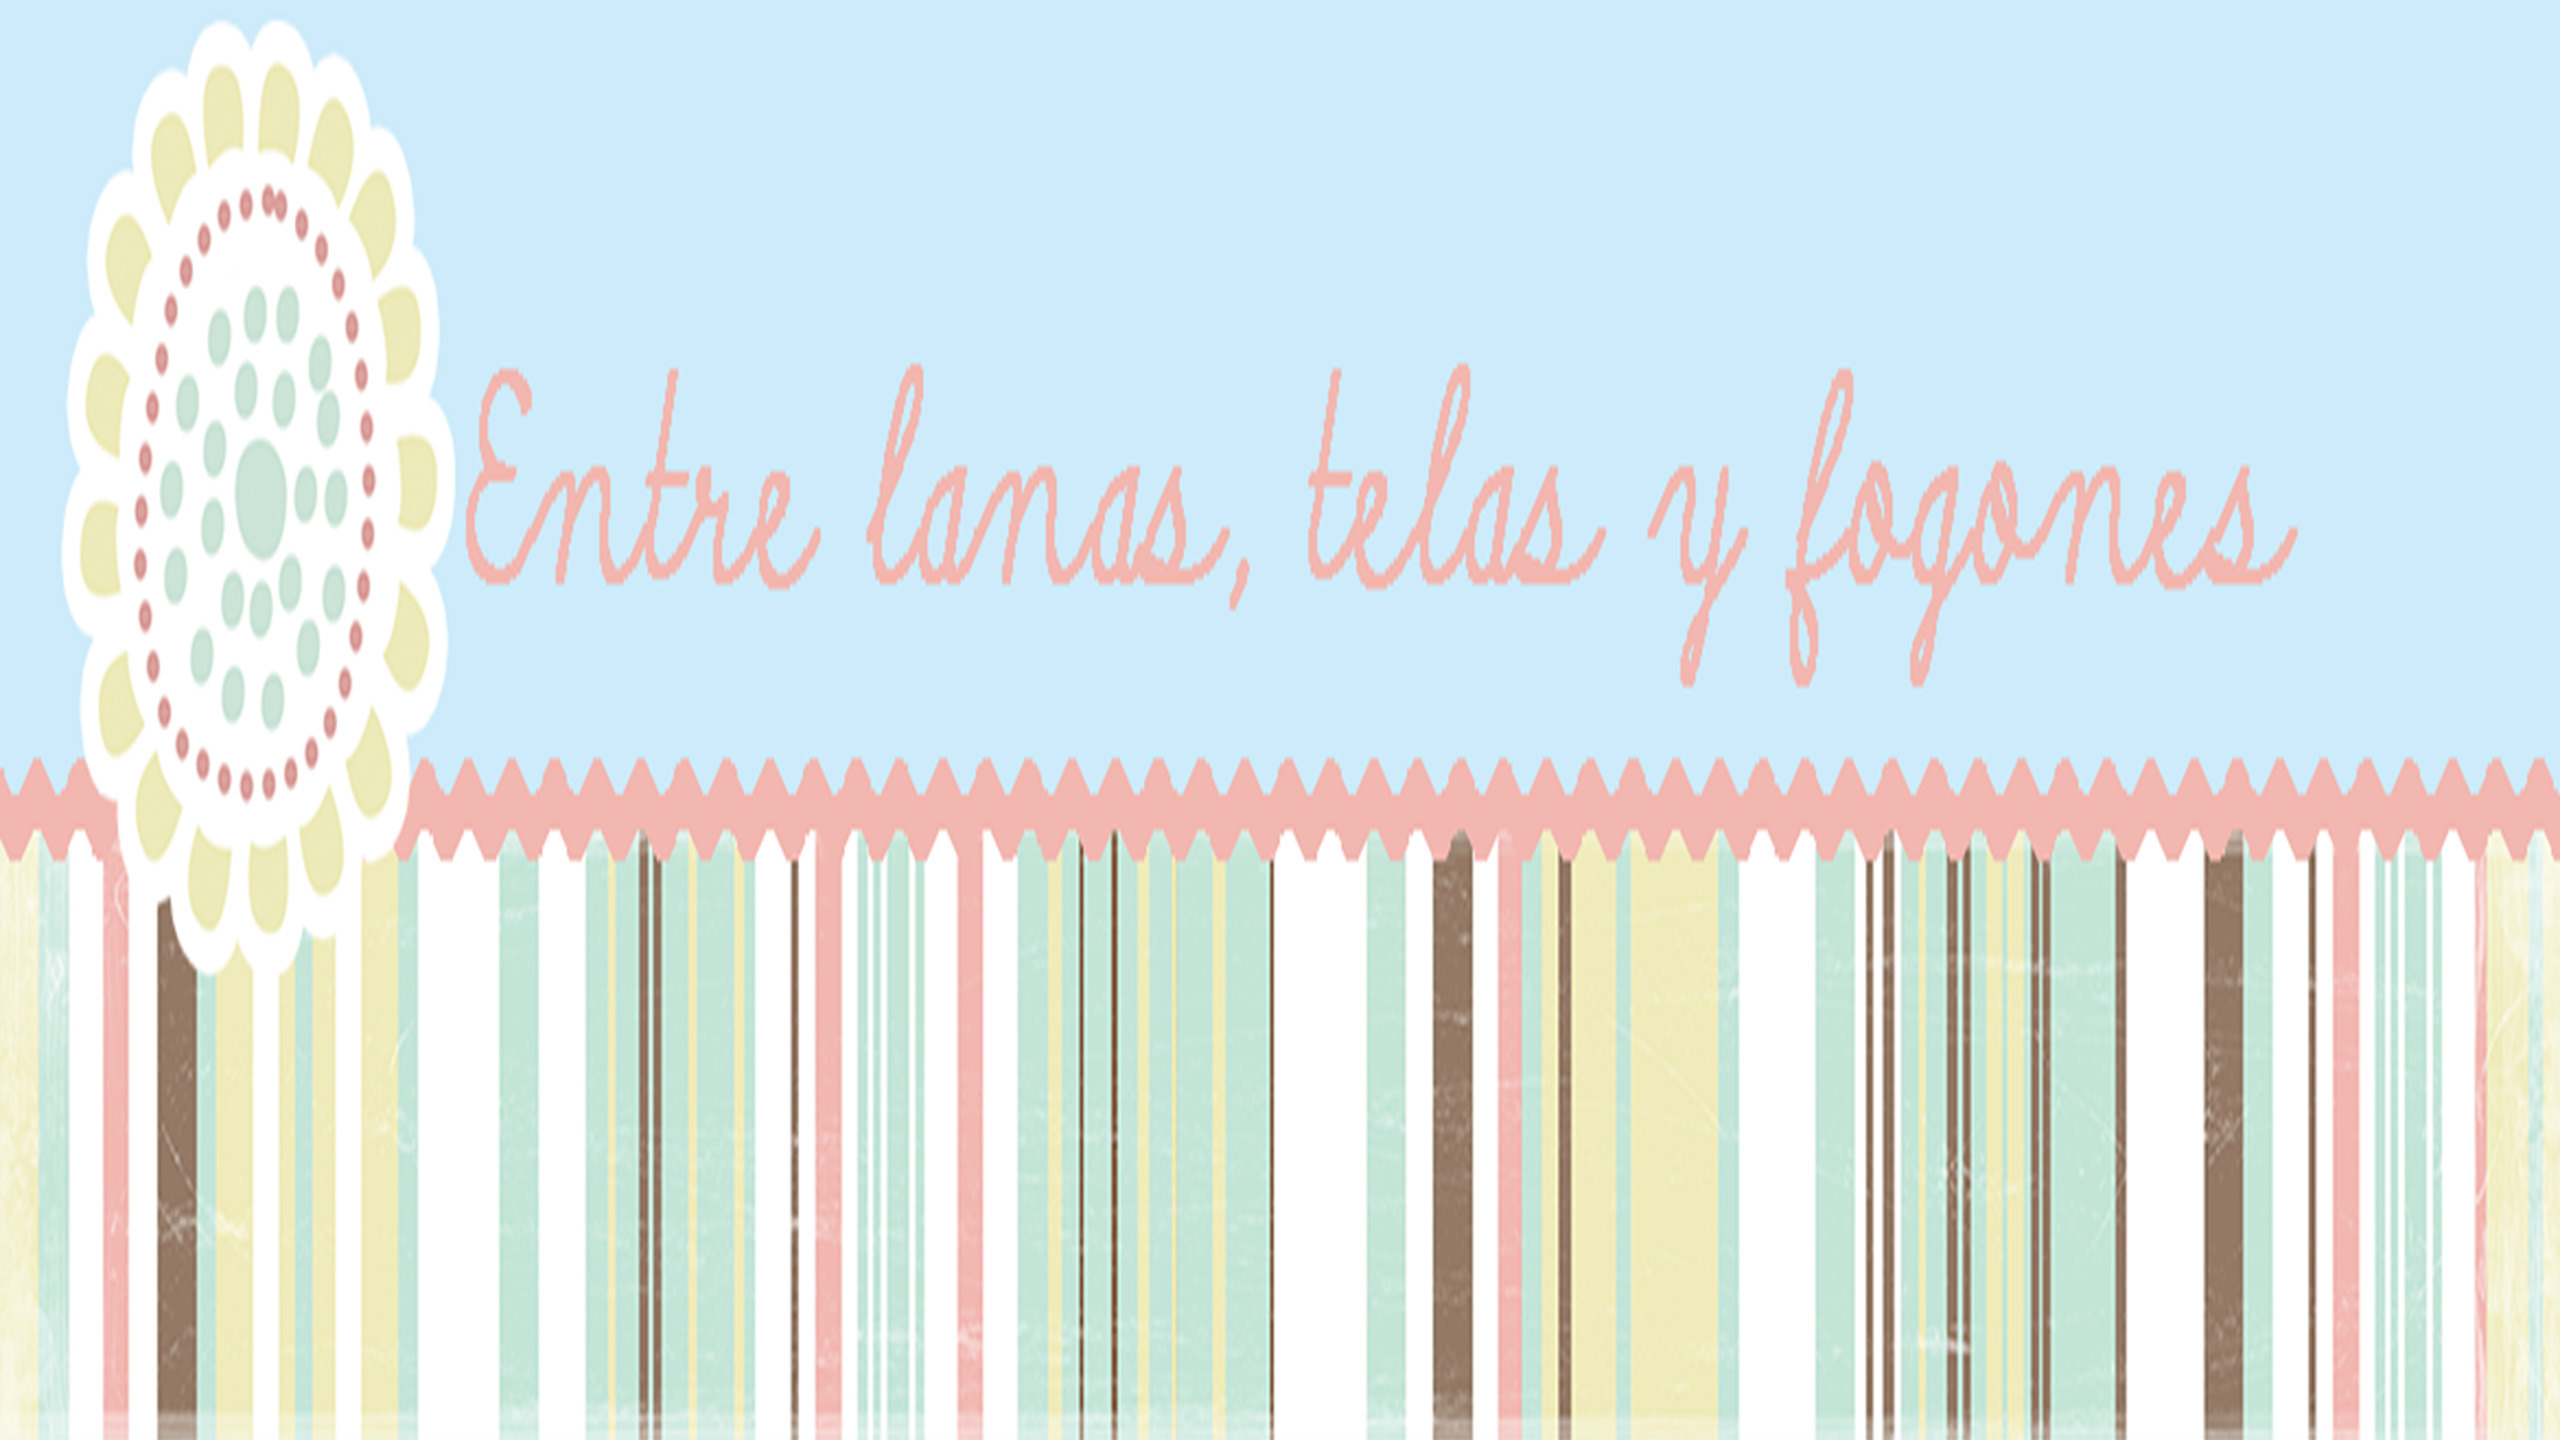 Entre lanas, telas y fogones (@entrelanastelasyfogones) Cover Image